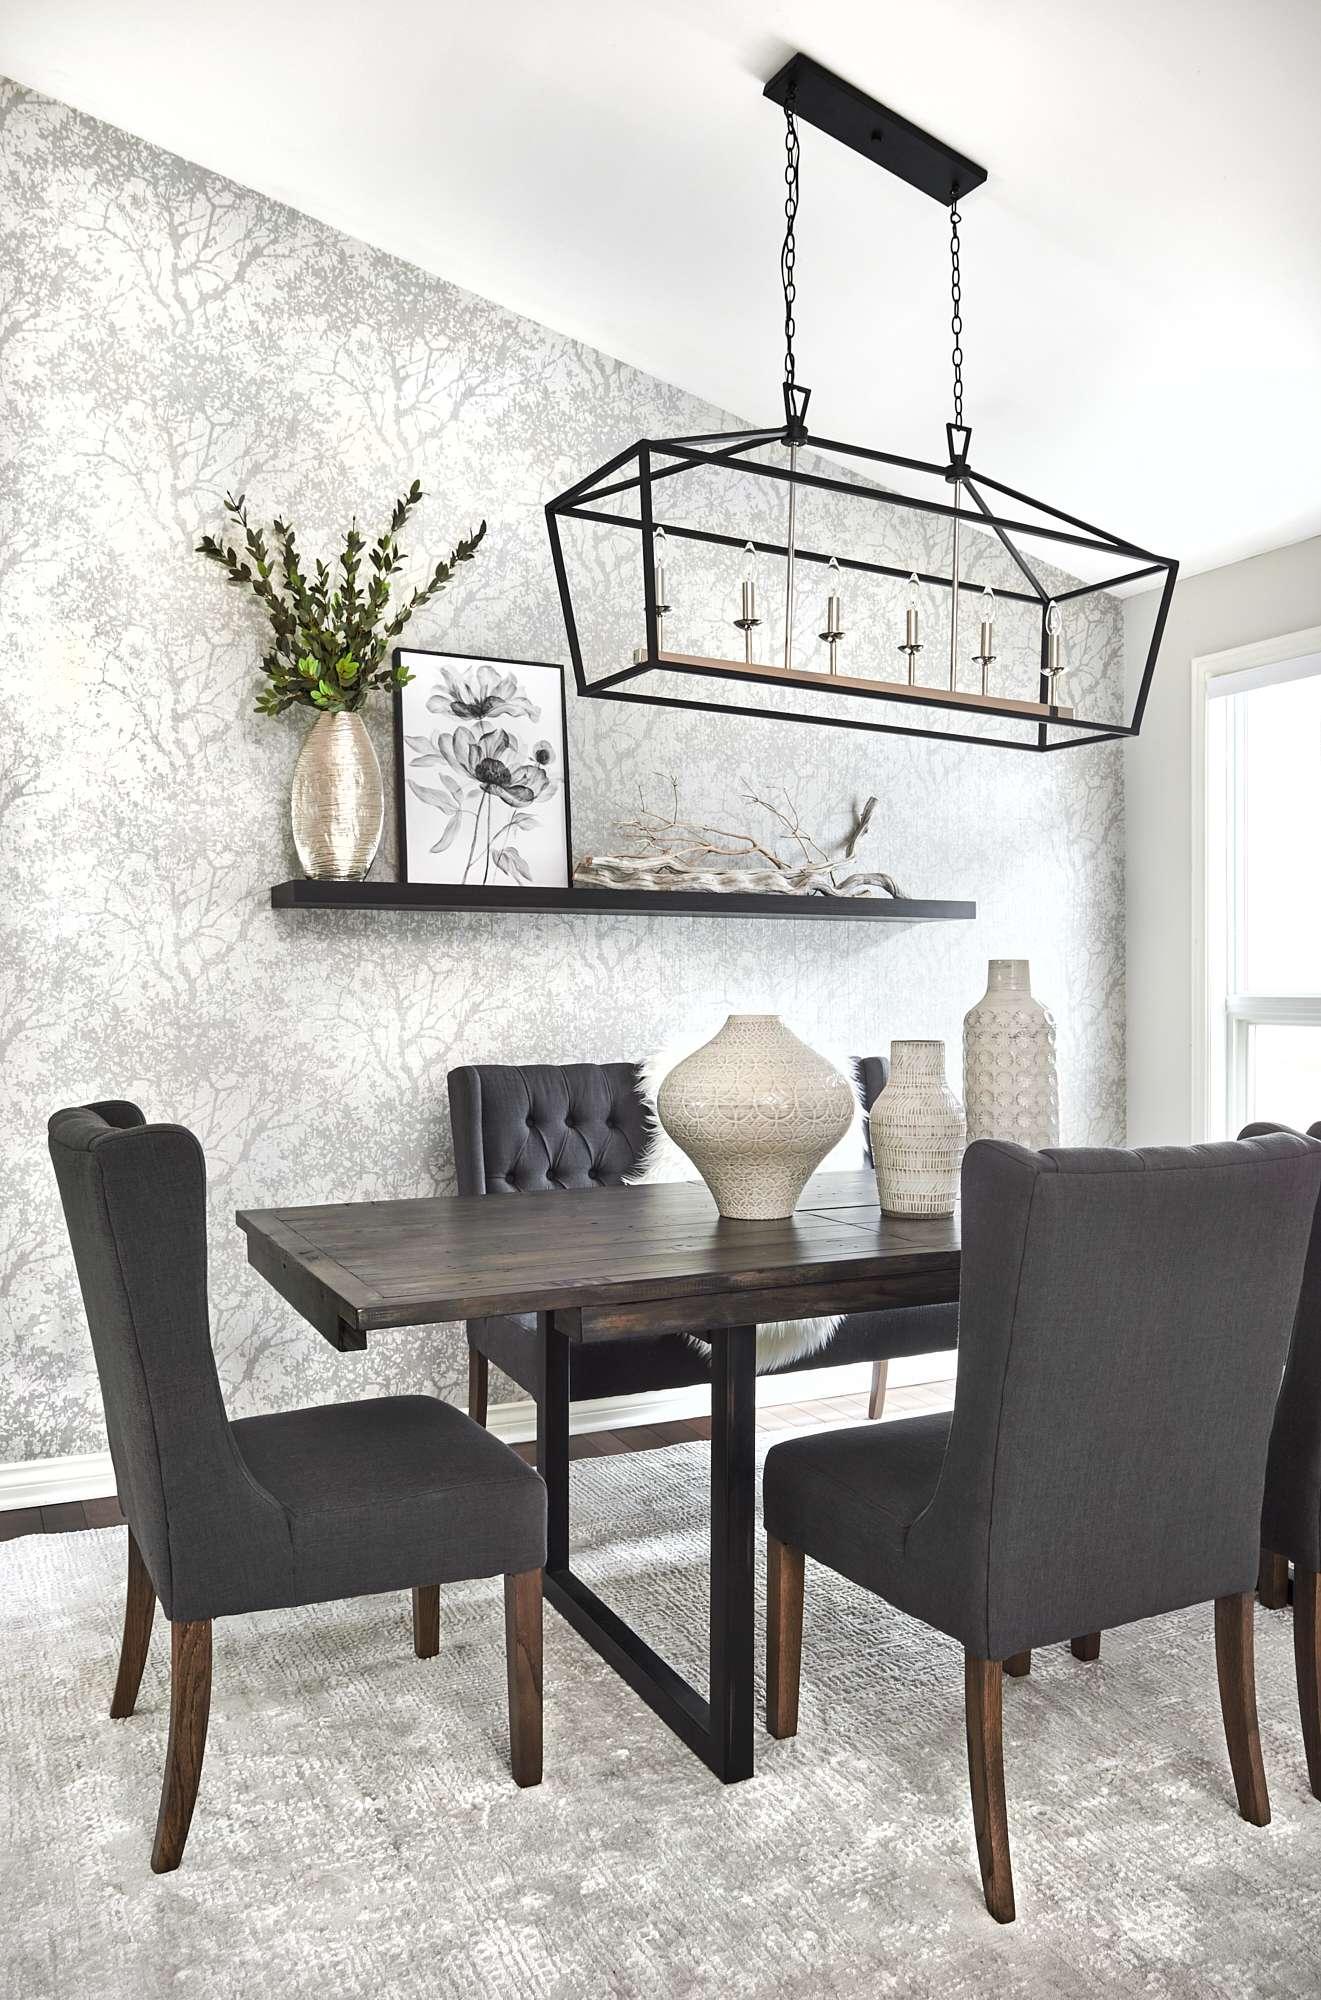 Gray Dining Room Design wallpaper rustic pottery kempenfelt bay